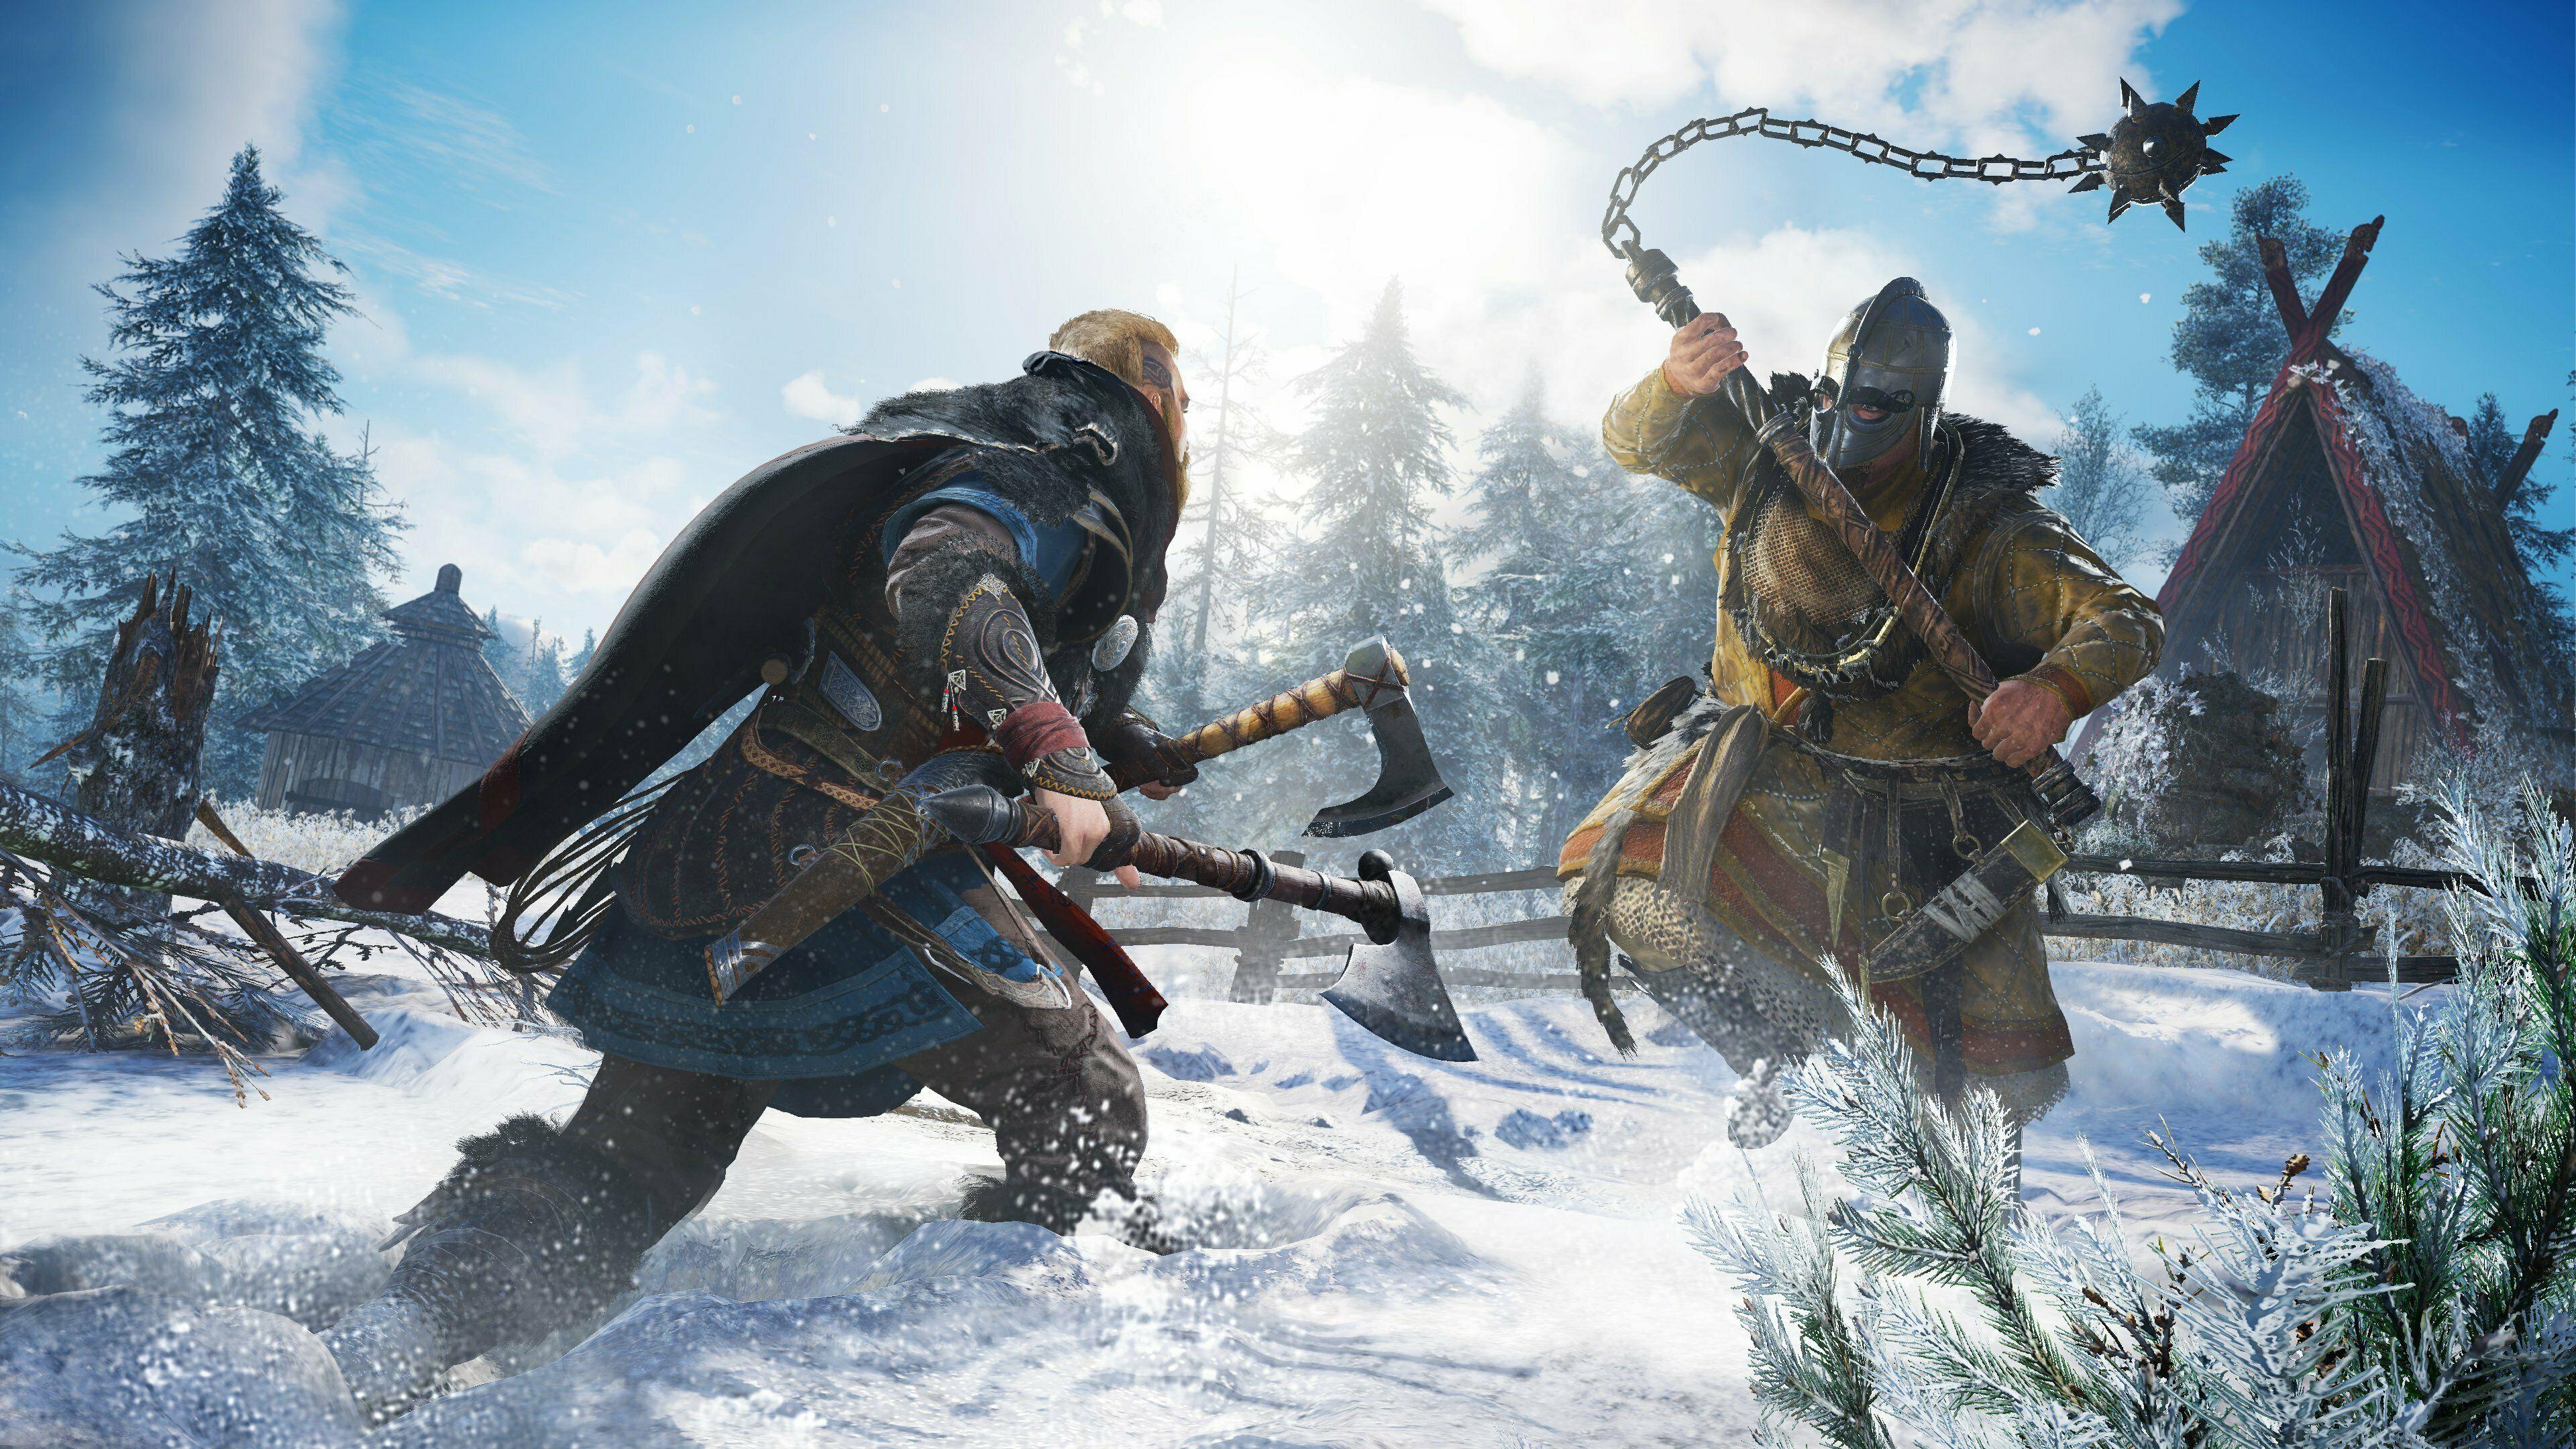 Einar Selvik fra bandet Wardruna skal skrive musikk til det kommende Assassin's Creed-spillet.